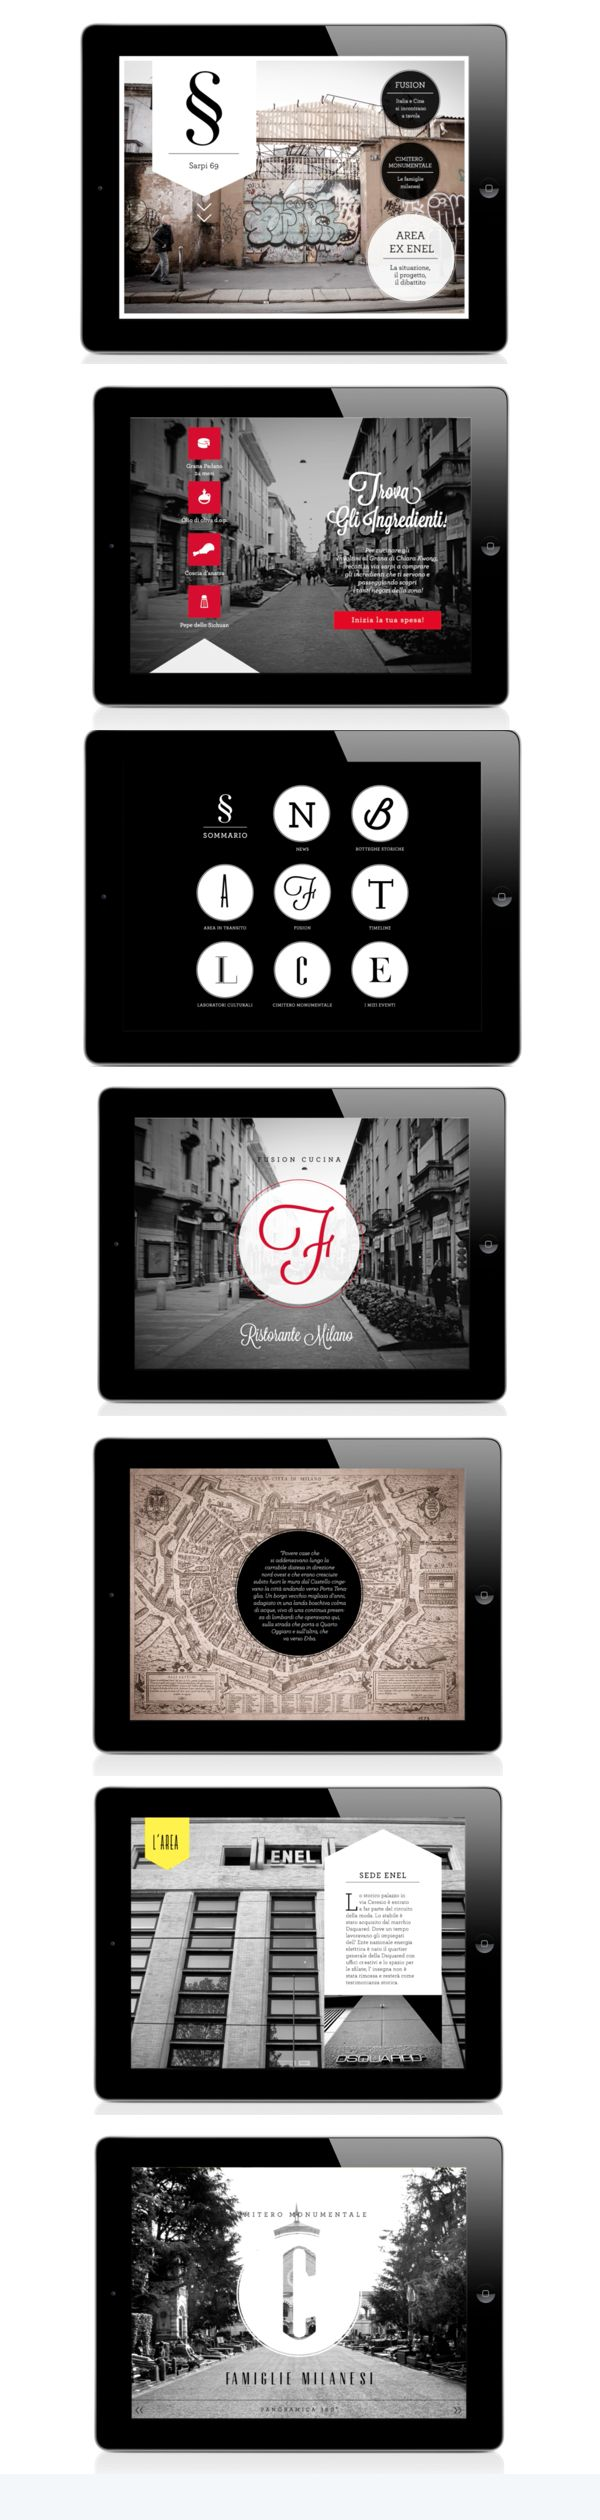 Sarpi 69 Magazine for iPad #MagPlanet #TabletMagazine #DigitalMag